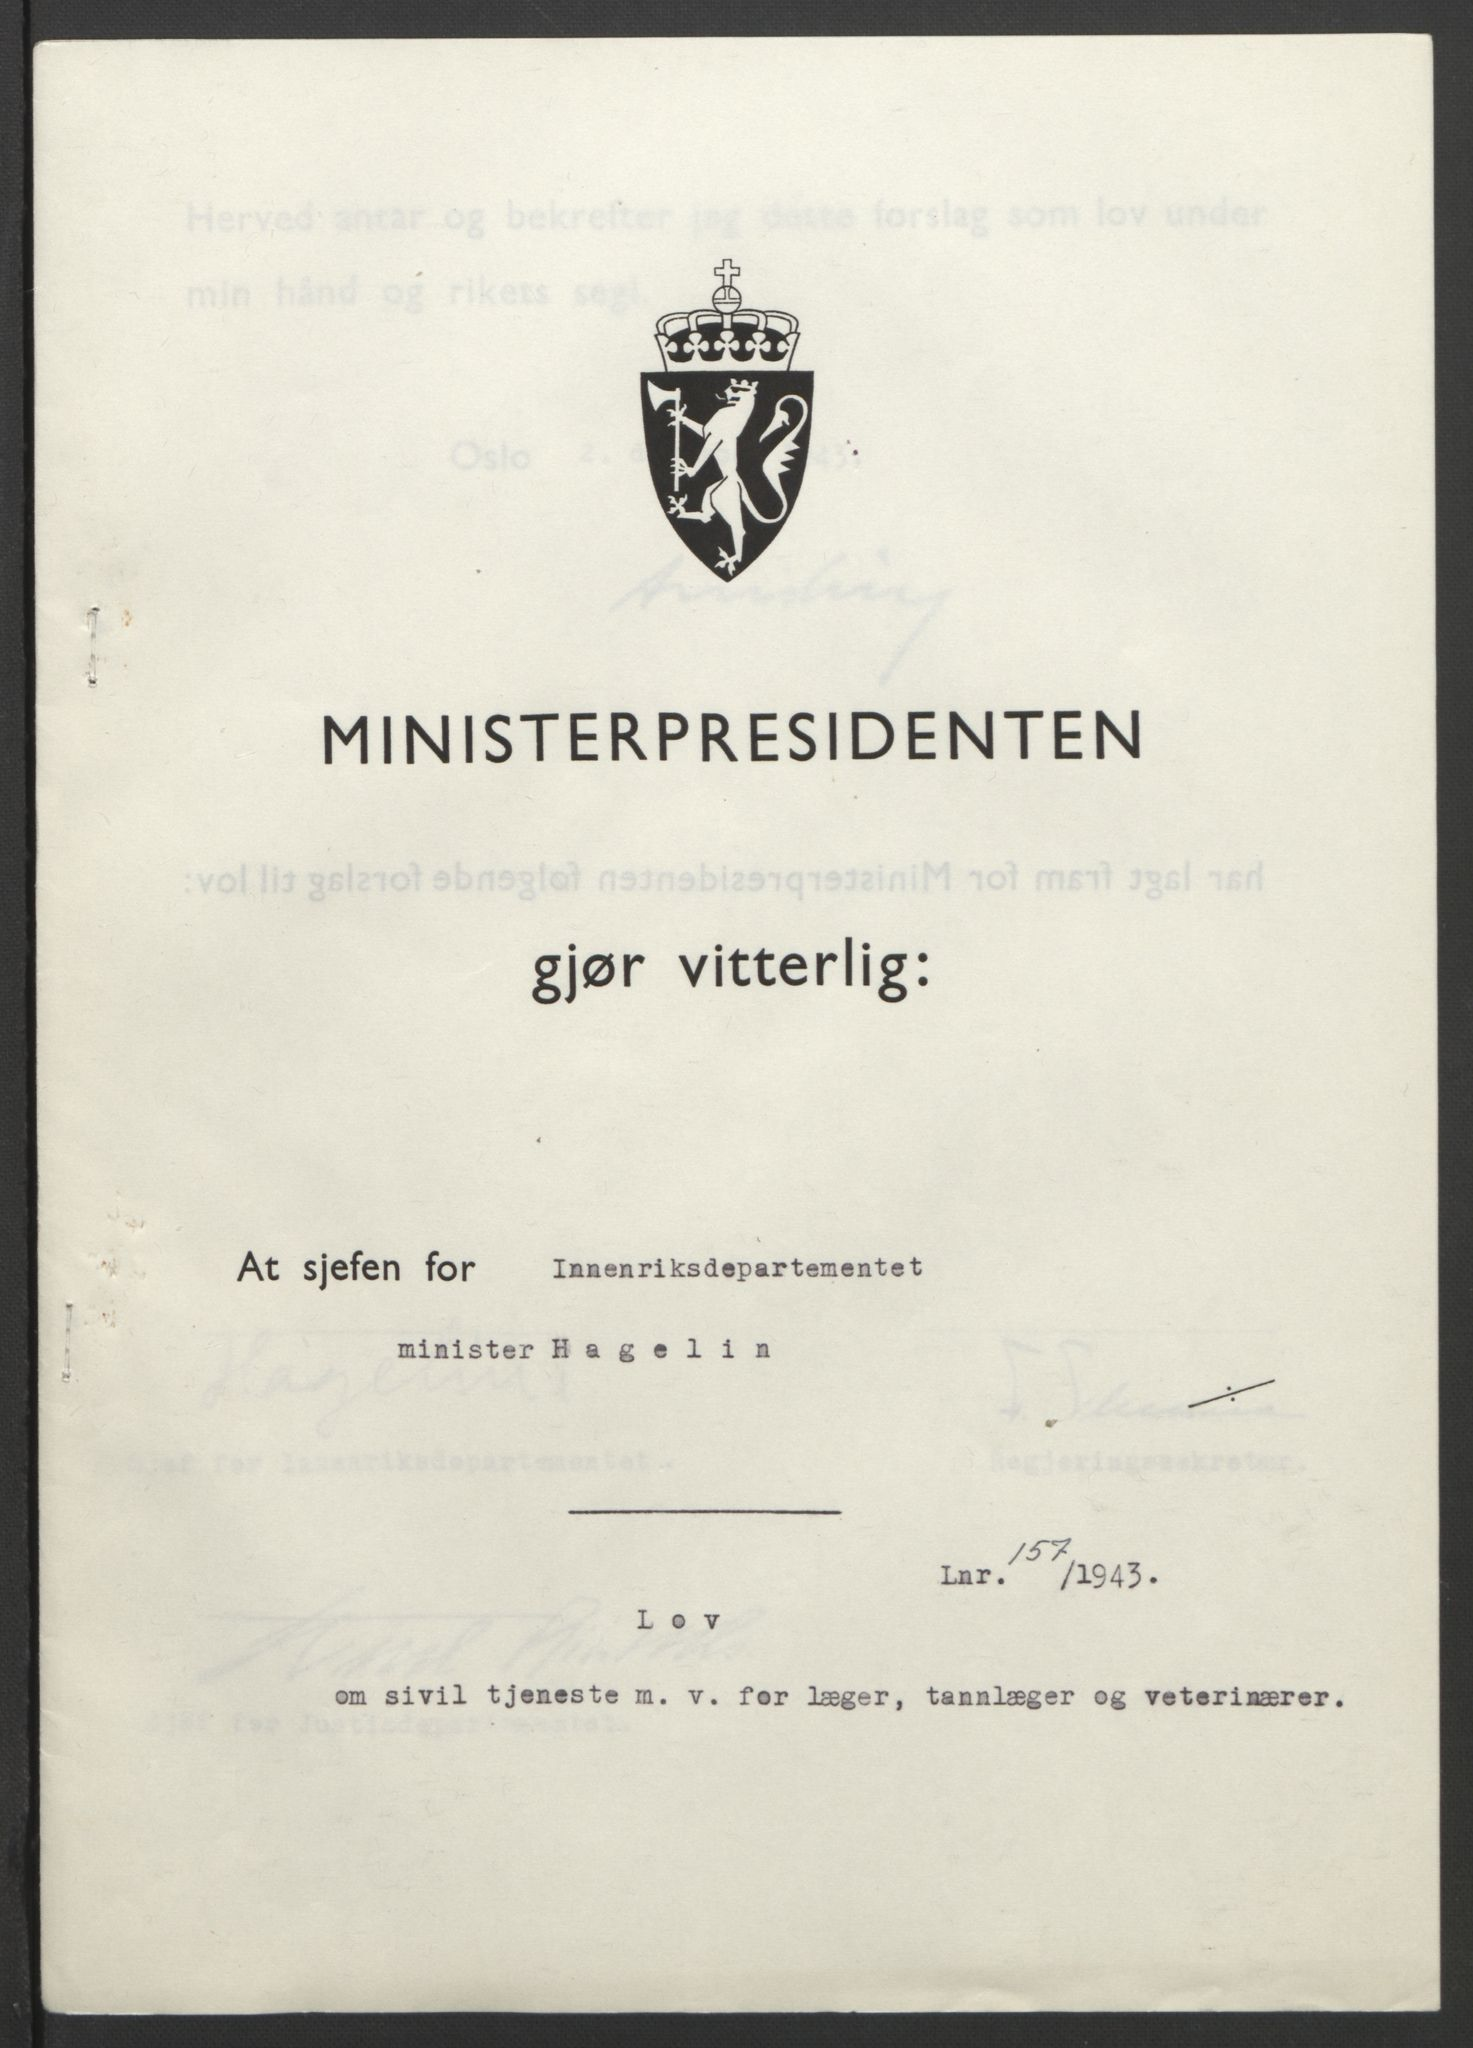 RA, NS-administrasjonen 1940-1945 (Statsrådsekretariatet, de kommisariske statsråder mm), D/Db/L0099: Lover, 1943, s. 743